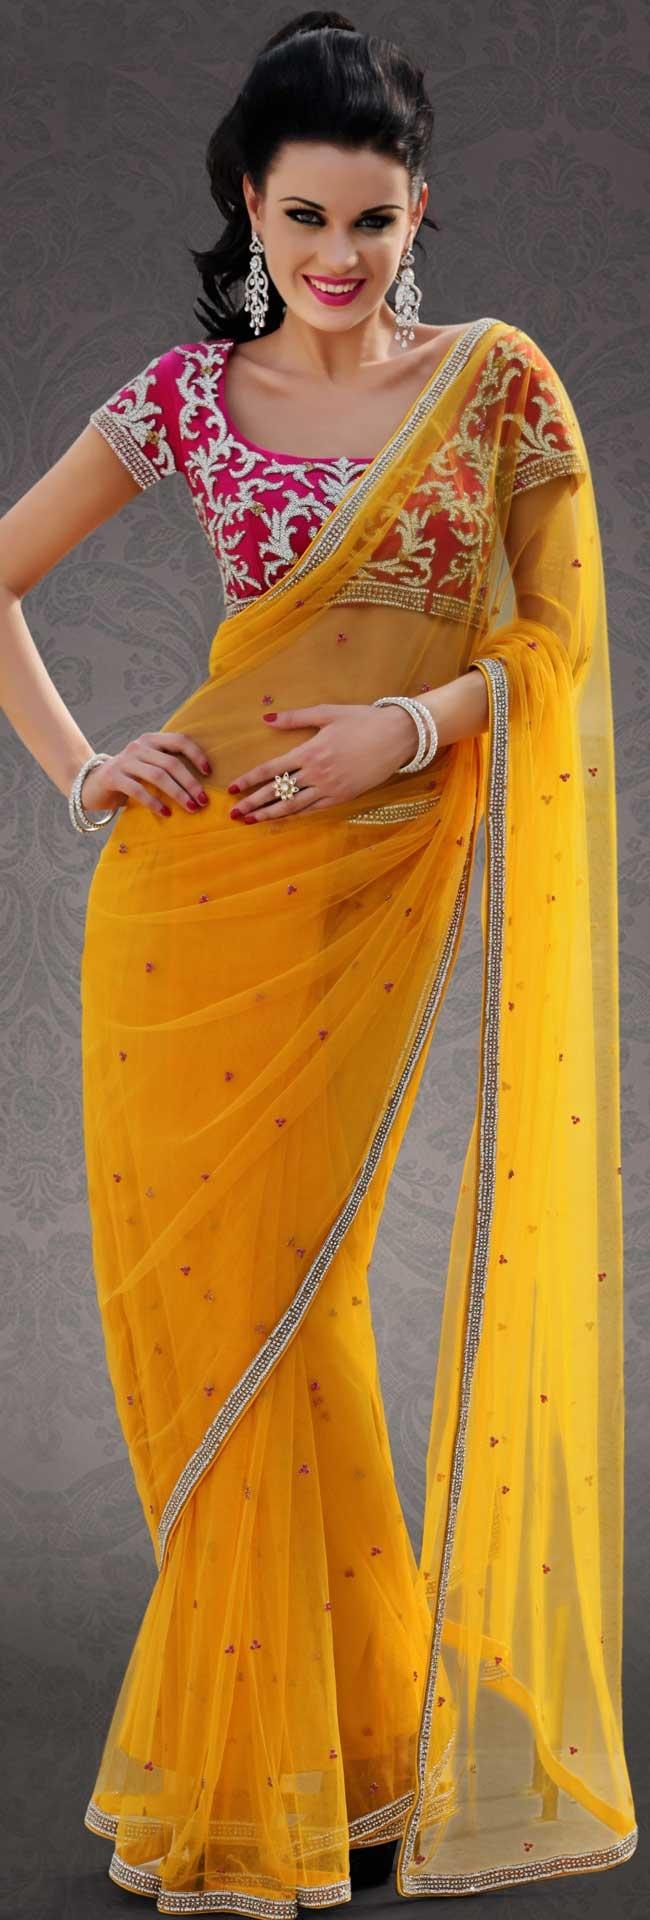 Saree blouse design patch work  best saree images on pinterest